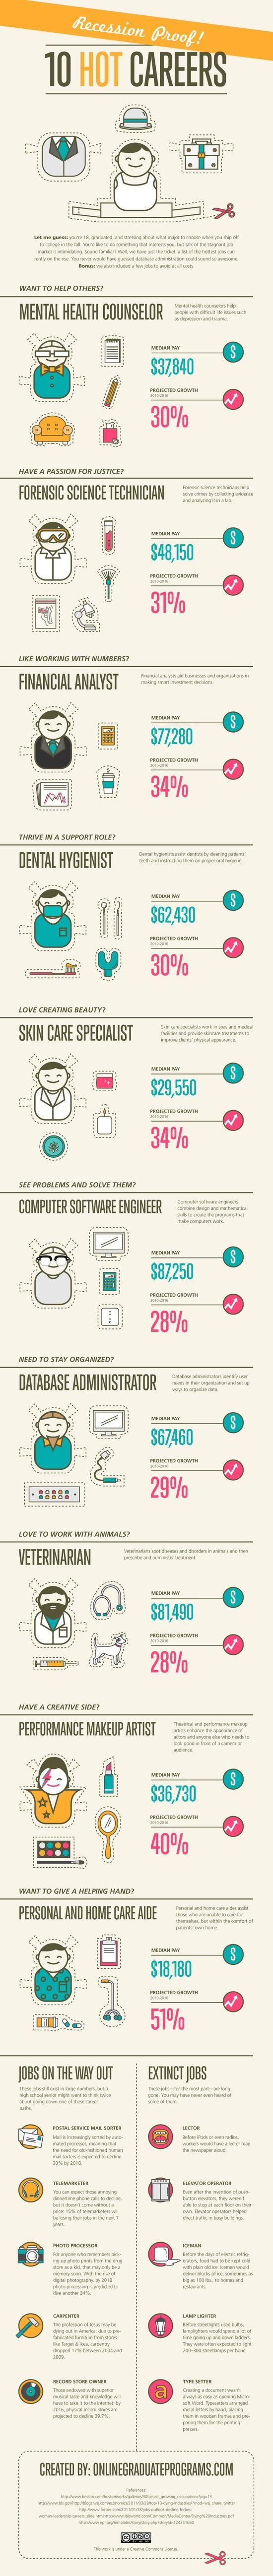 Recession-Proof Professions infographic via OnlineGraduatePrograms